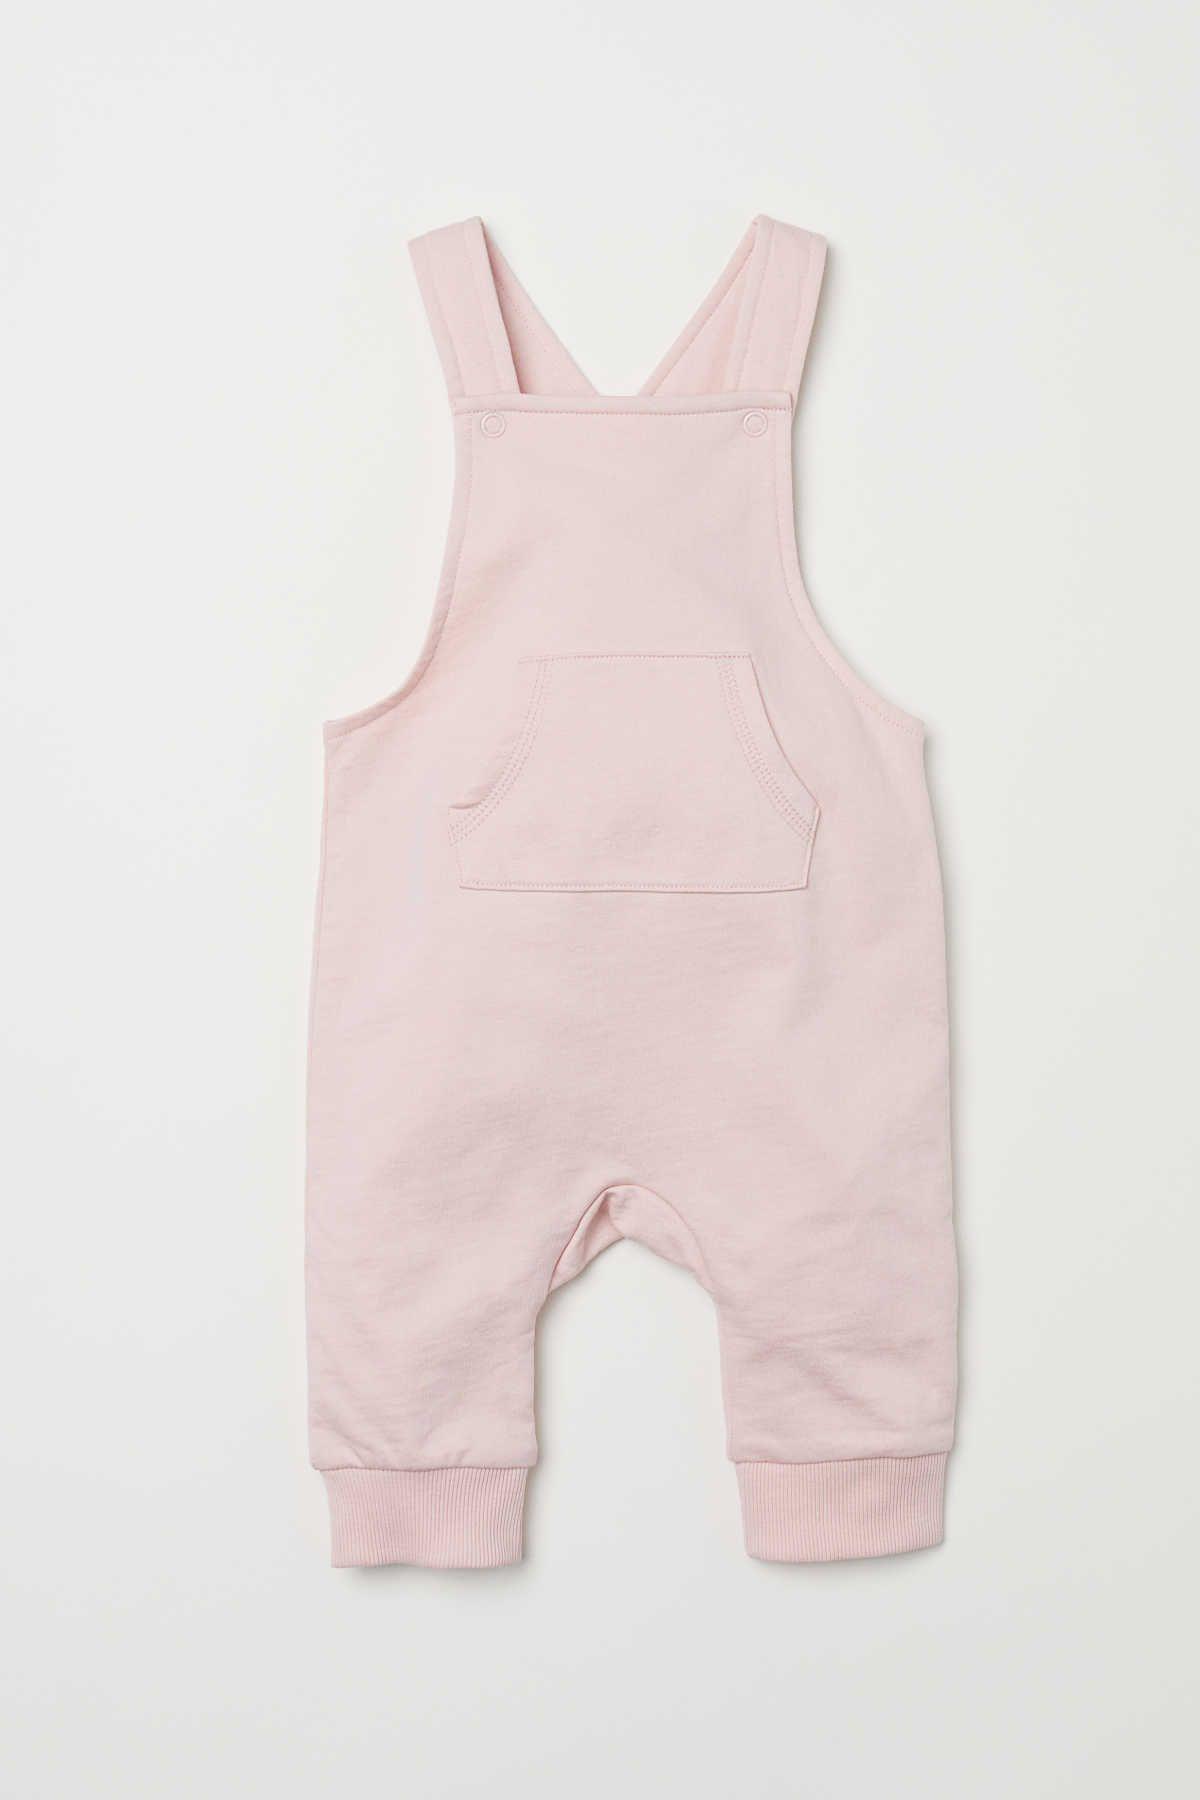 3b8a501c8 Powder pink. CONSCIOUS. Bib overalls in soft organic cotton ...